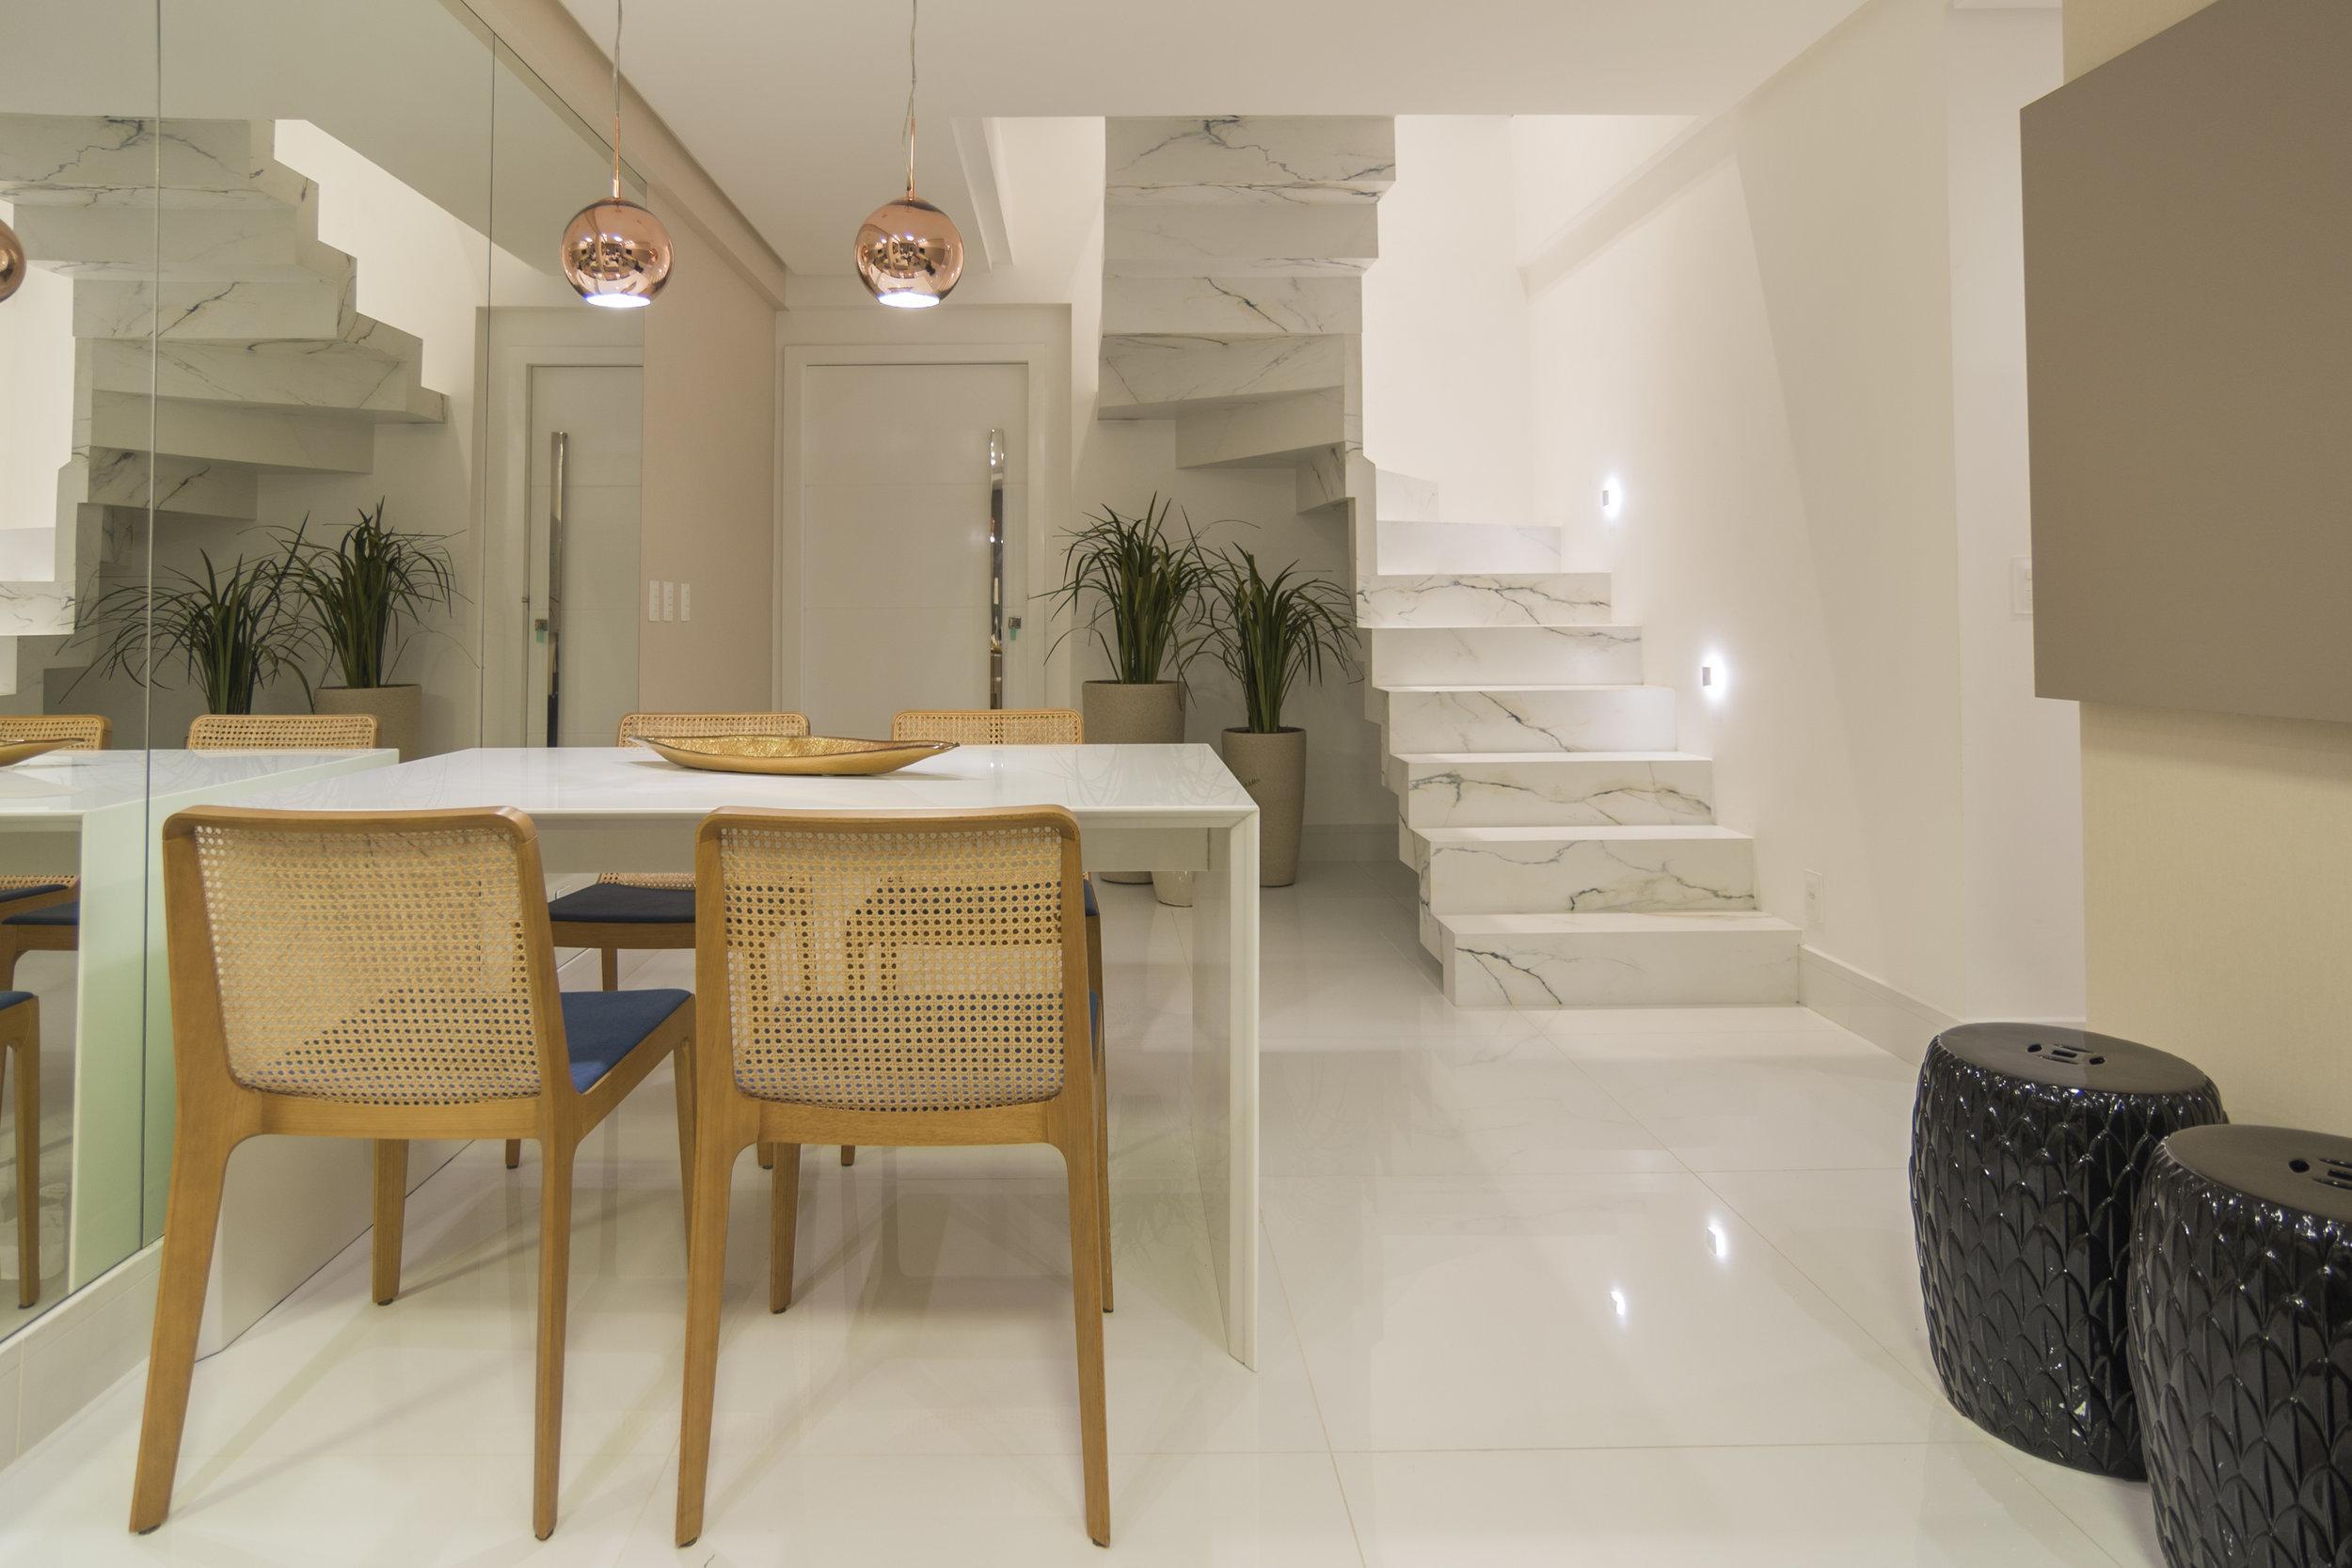 projeto-arquitetonico-robertoindira-duo-arquitetura-apartamentos-estar-09.jpg